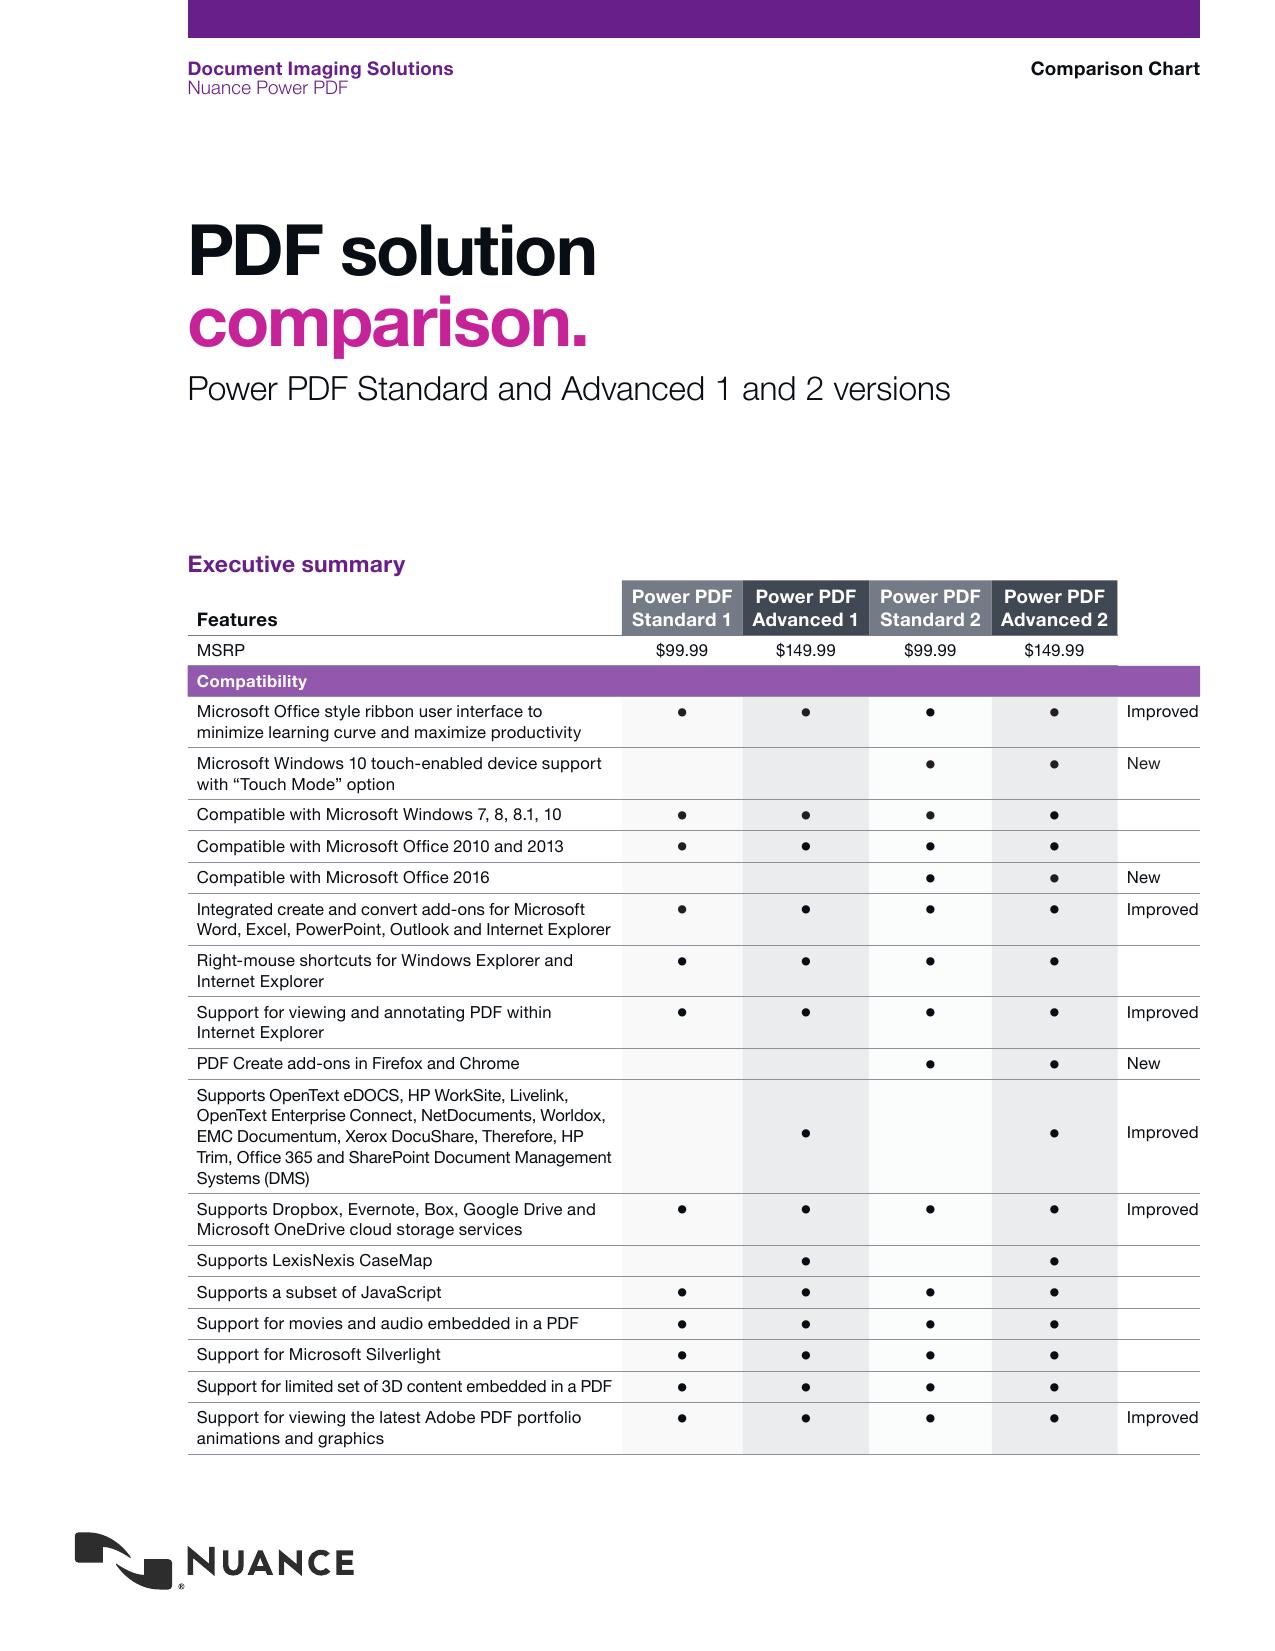 nuance power pdf advanced vs standard